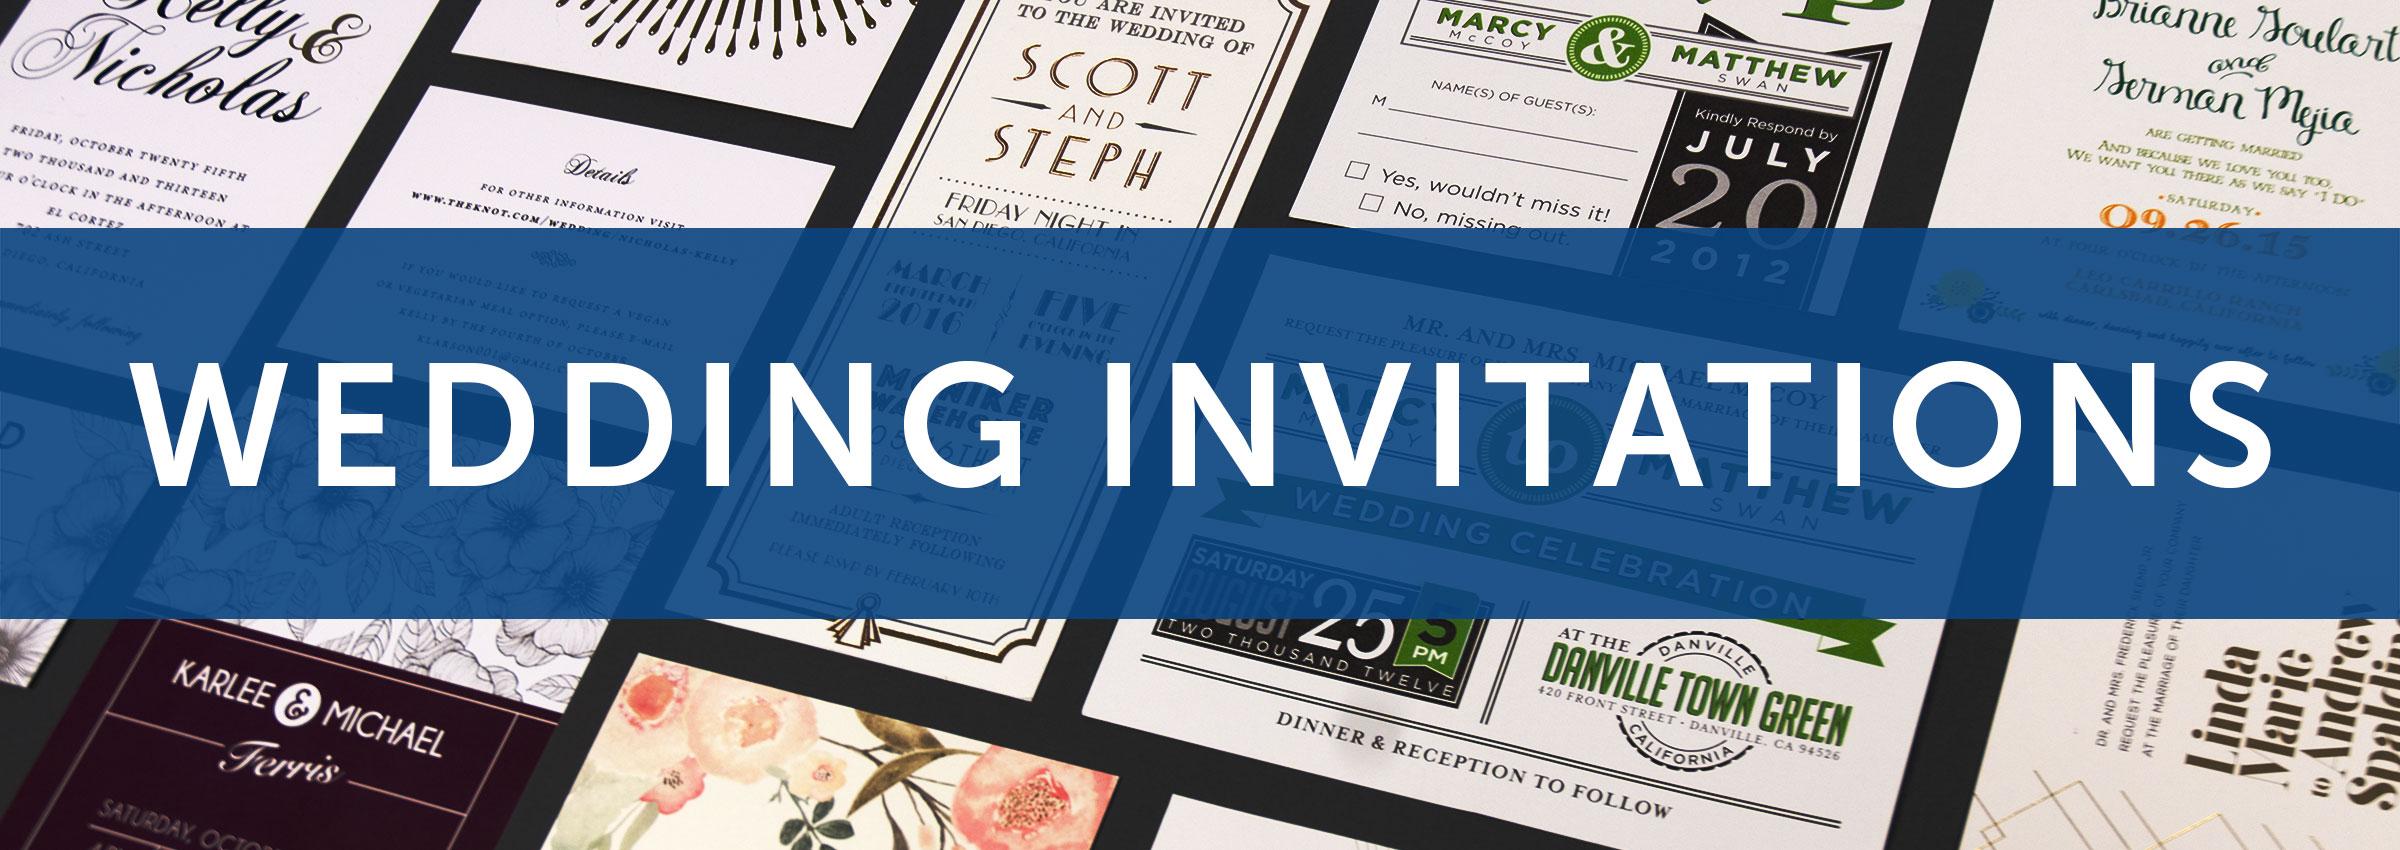 Wedding invitation packages custom design printing so cal graphics san diego wedding invitations stopboris Gallery